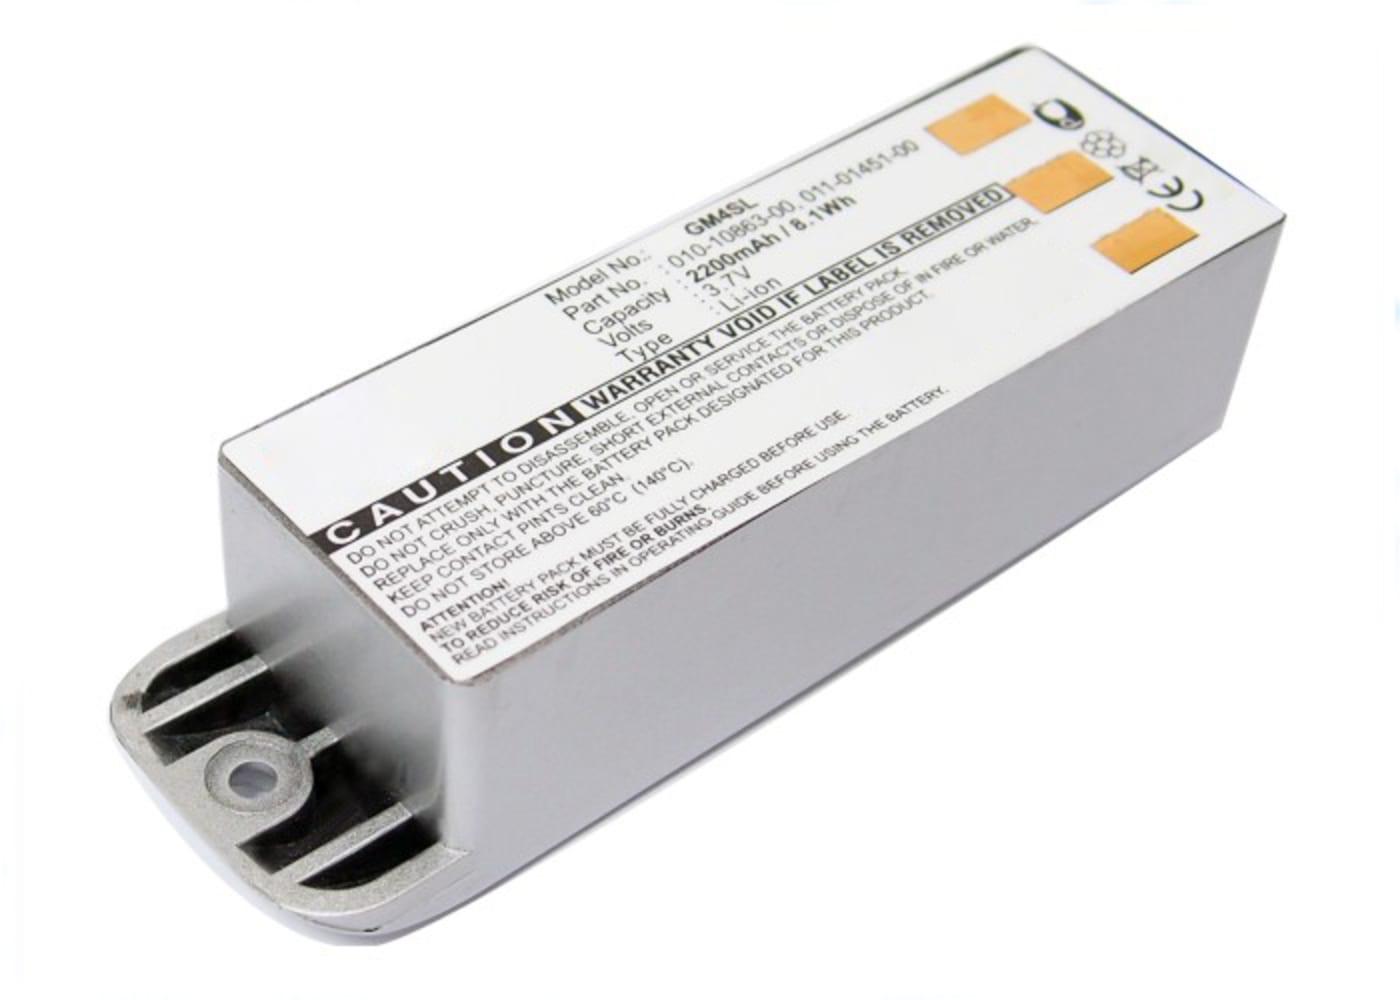 Batterie pour navigateur GPS Garmin zumo 400 zumo 450 zumo 500 zumo 500 Deluxe zumo 550 - 010-10863-00, 011-01451-00 2200mAh